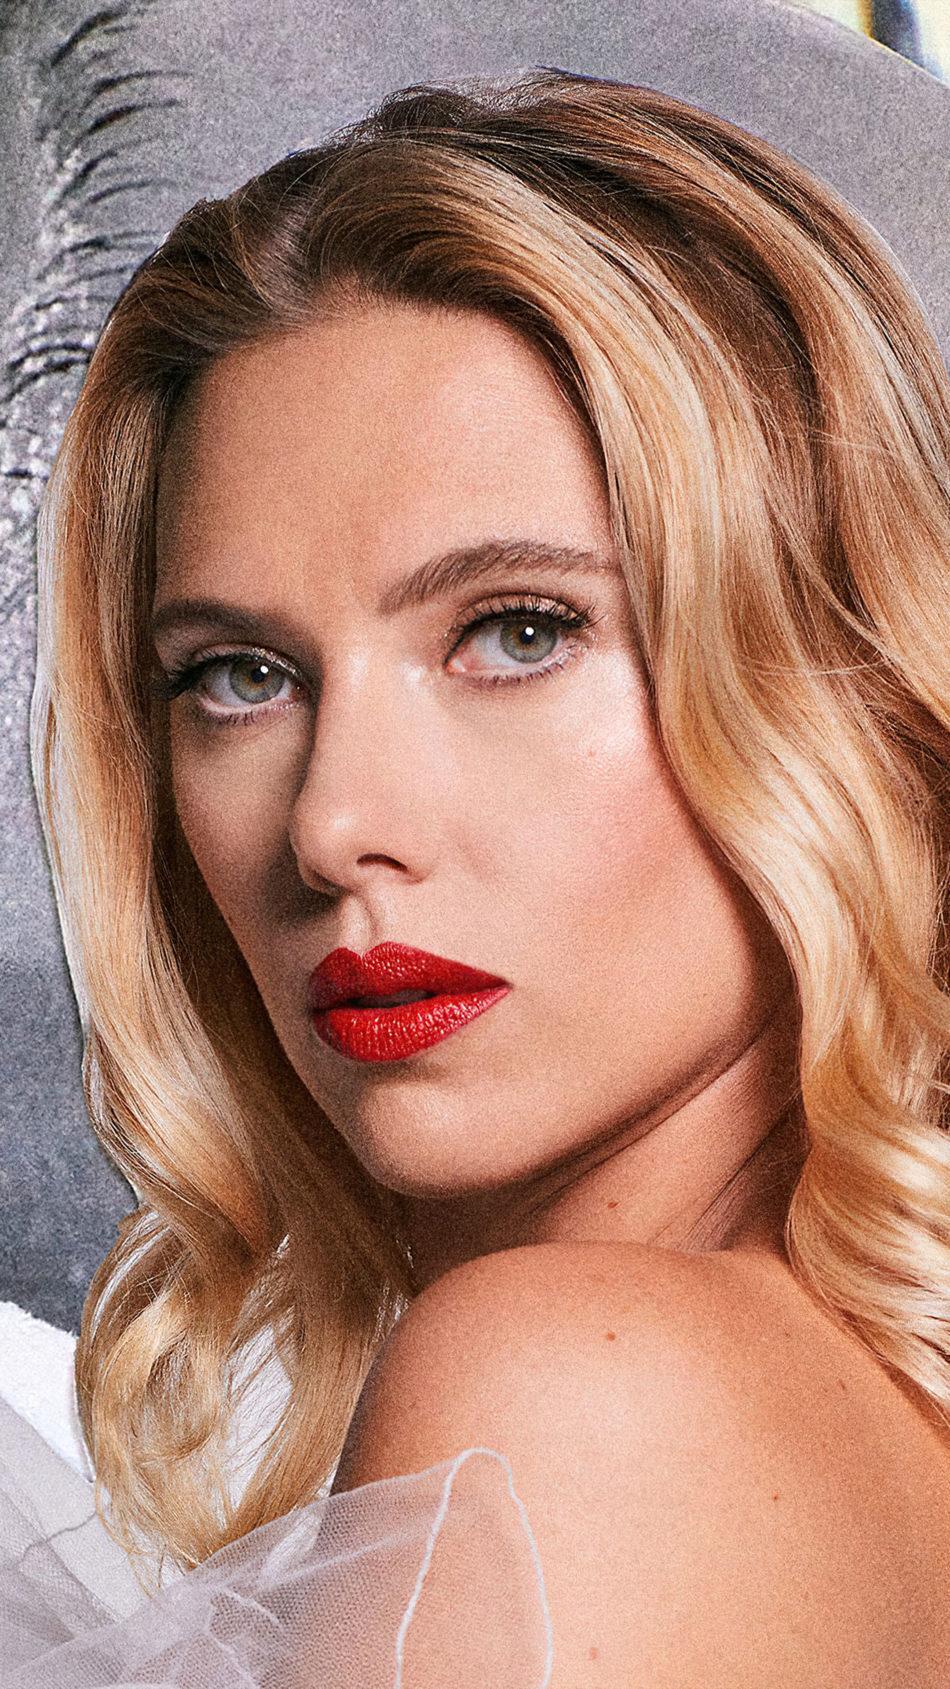 Scarlett Johansson Marie Claire 2020 Photoshoot 4K Ultra HD Mobile Wallpaper